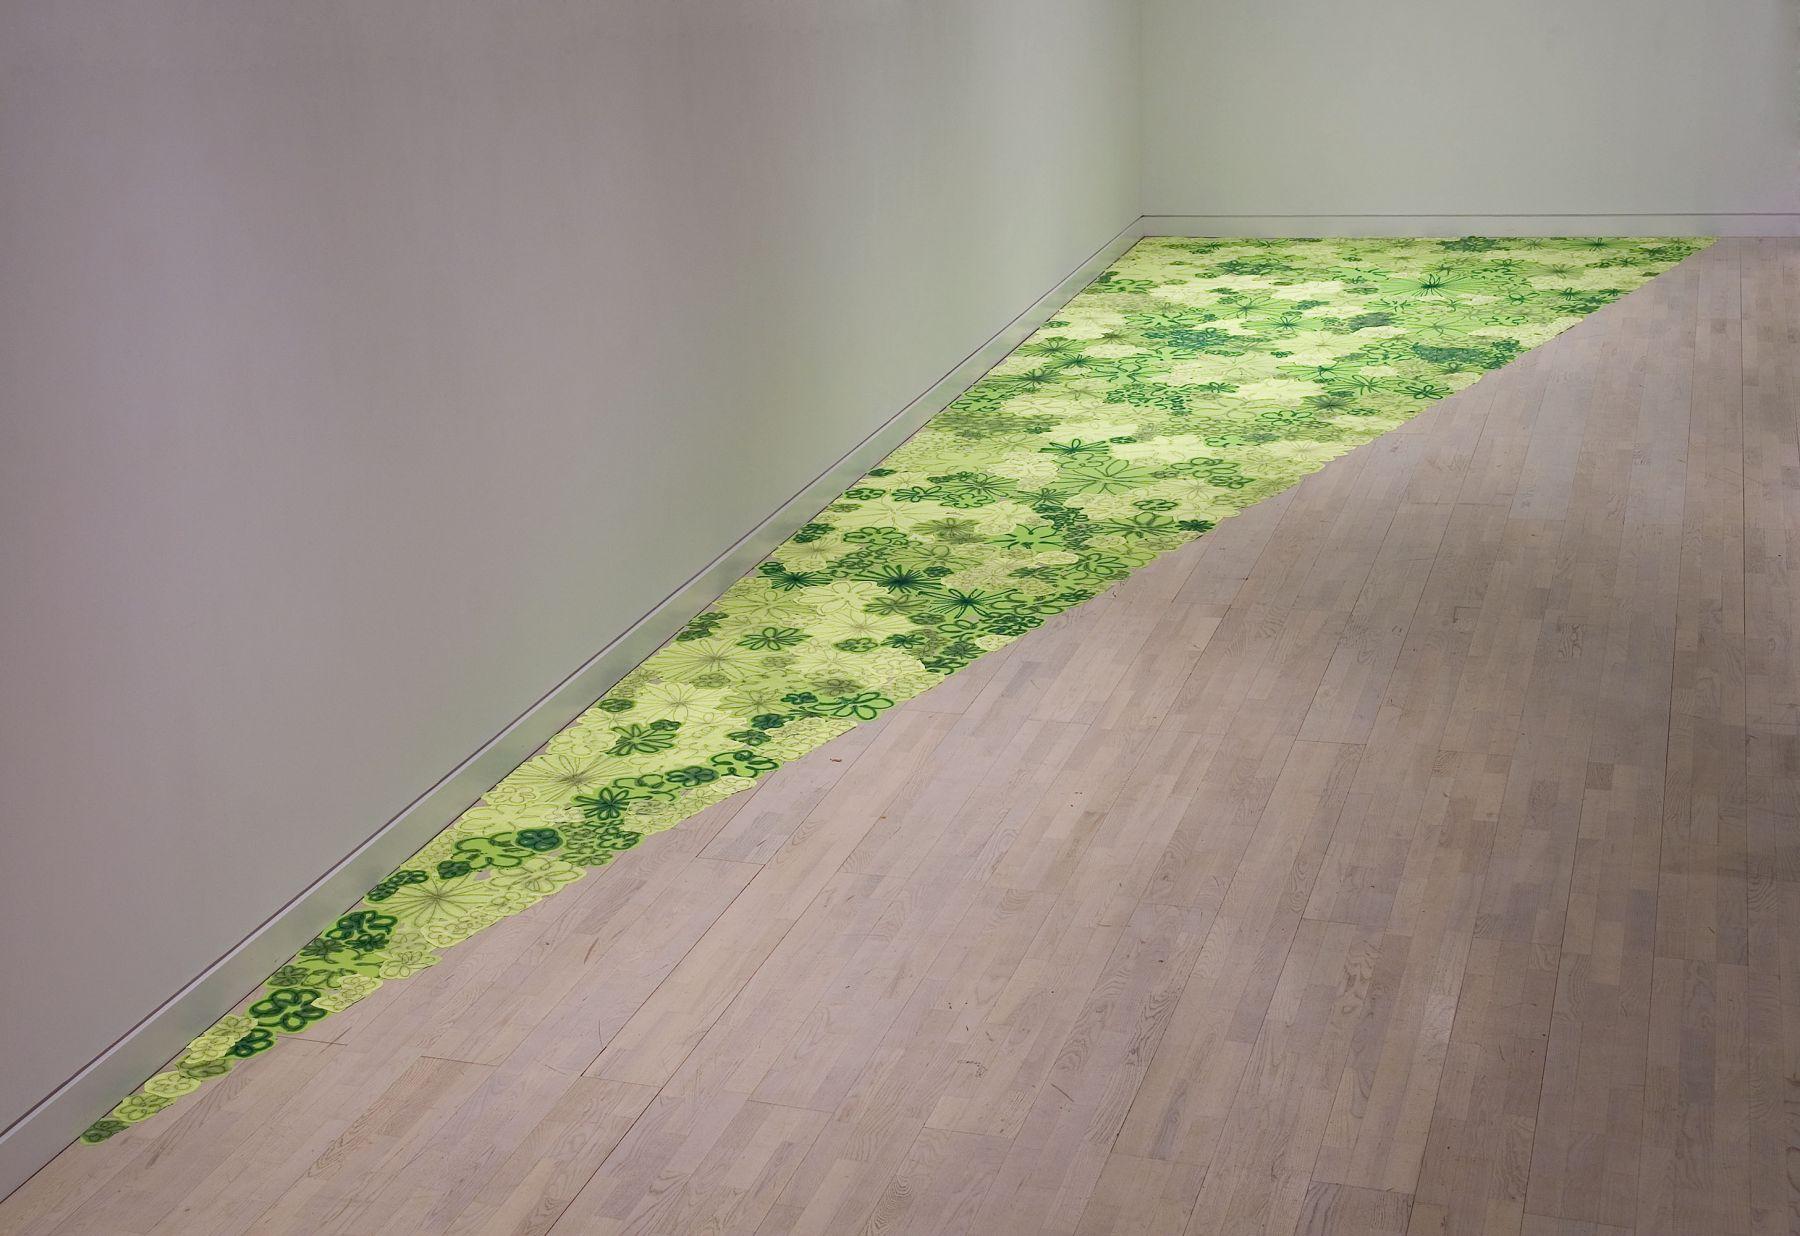 Polly Apfelbaum Locks Gallery